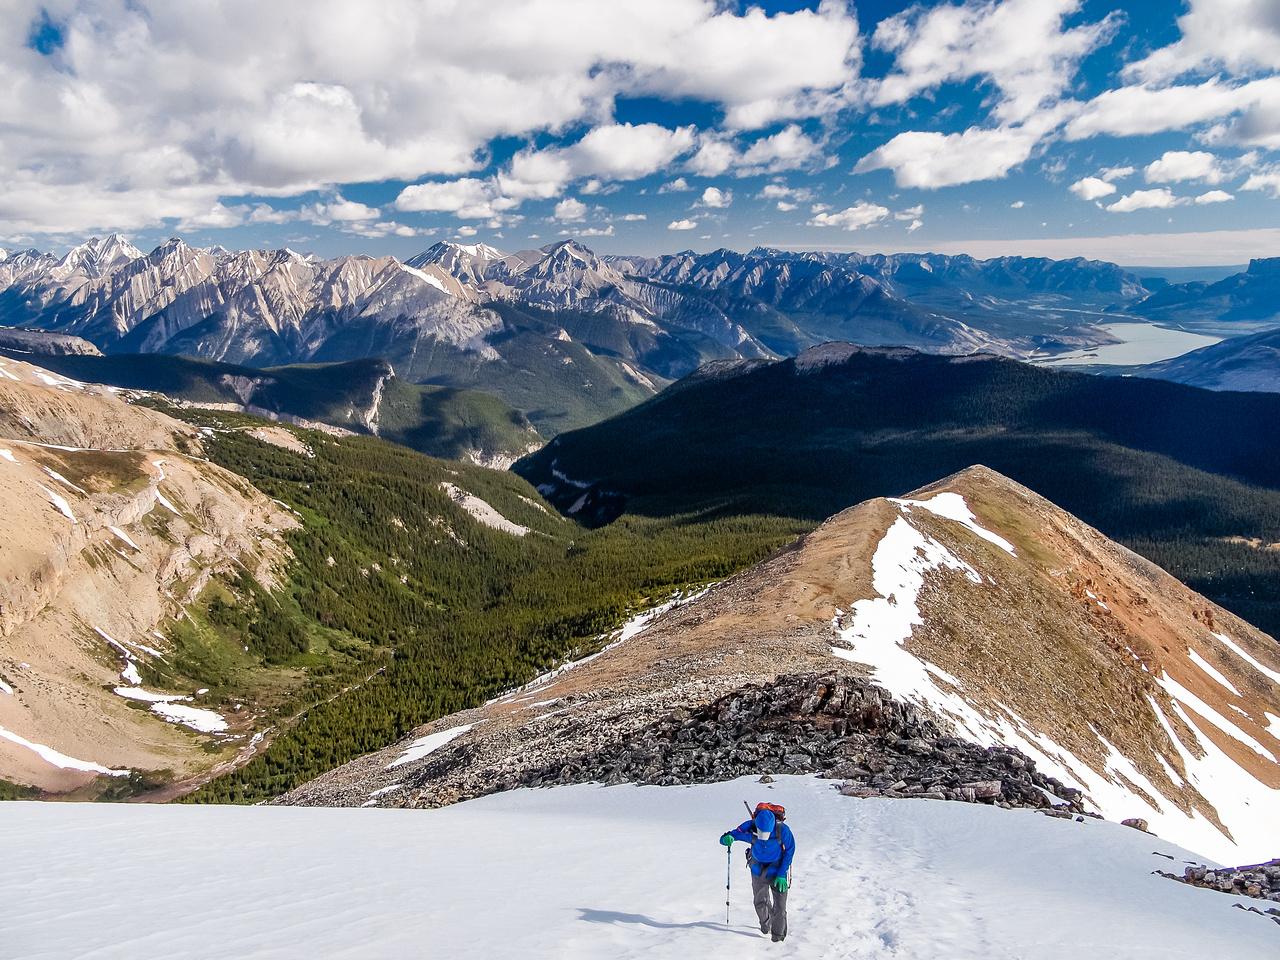 Some steep snow on the ridge.